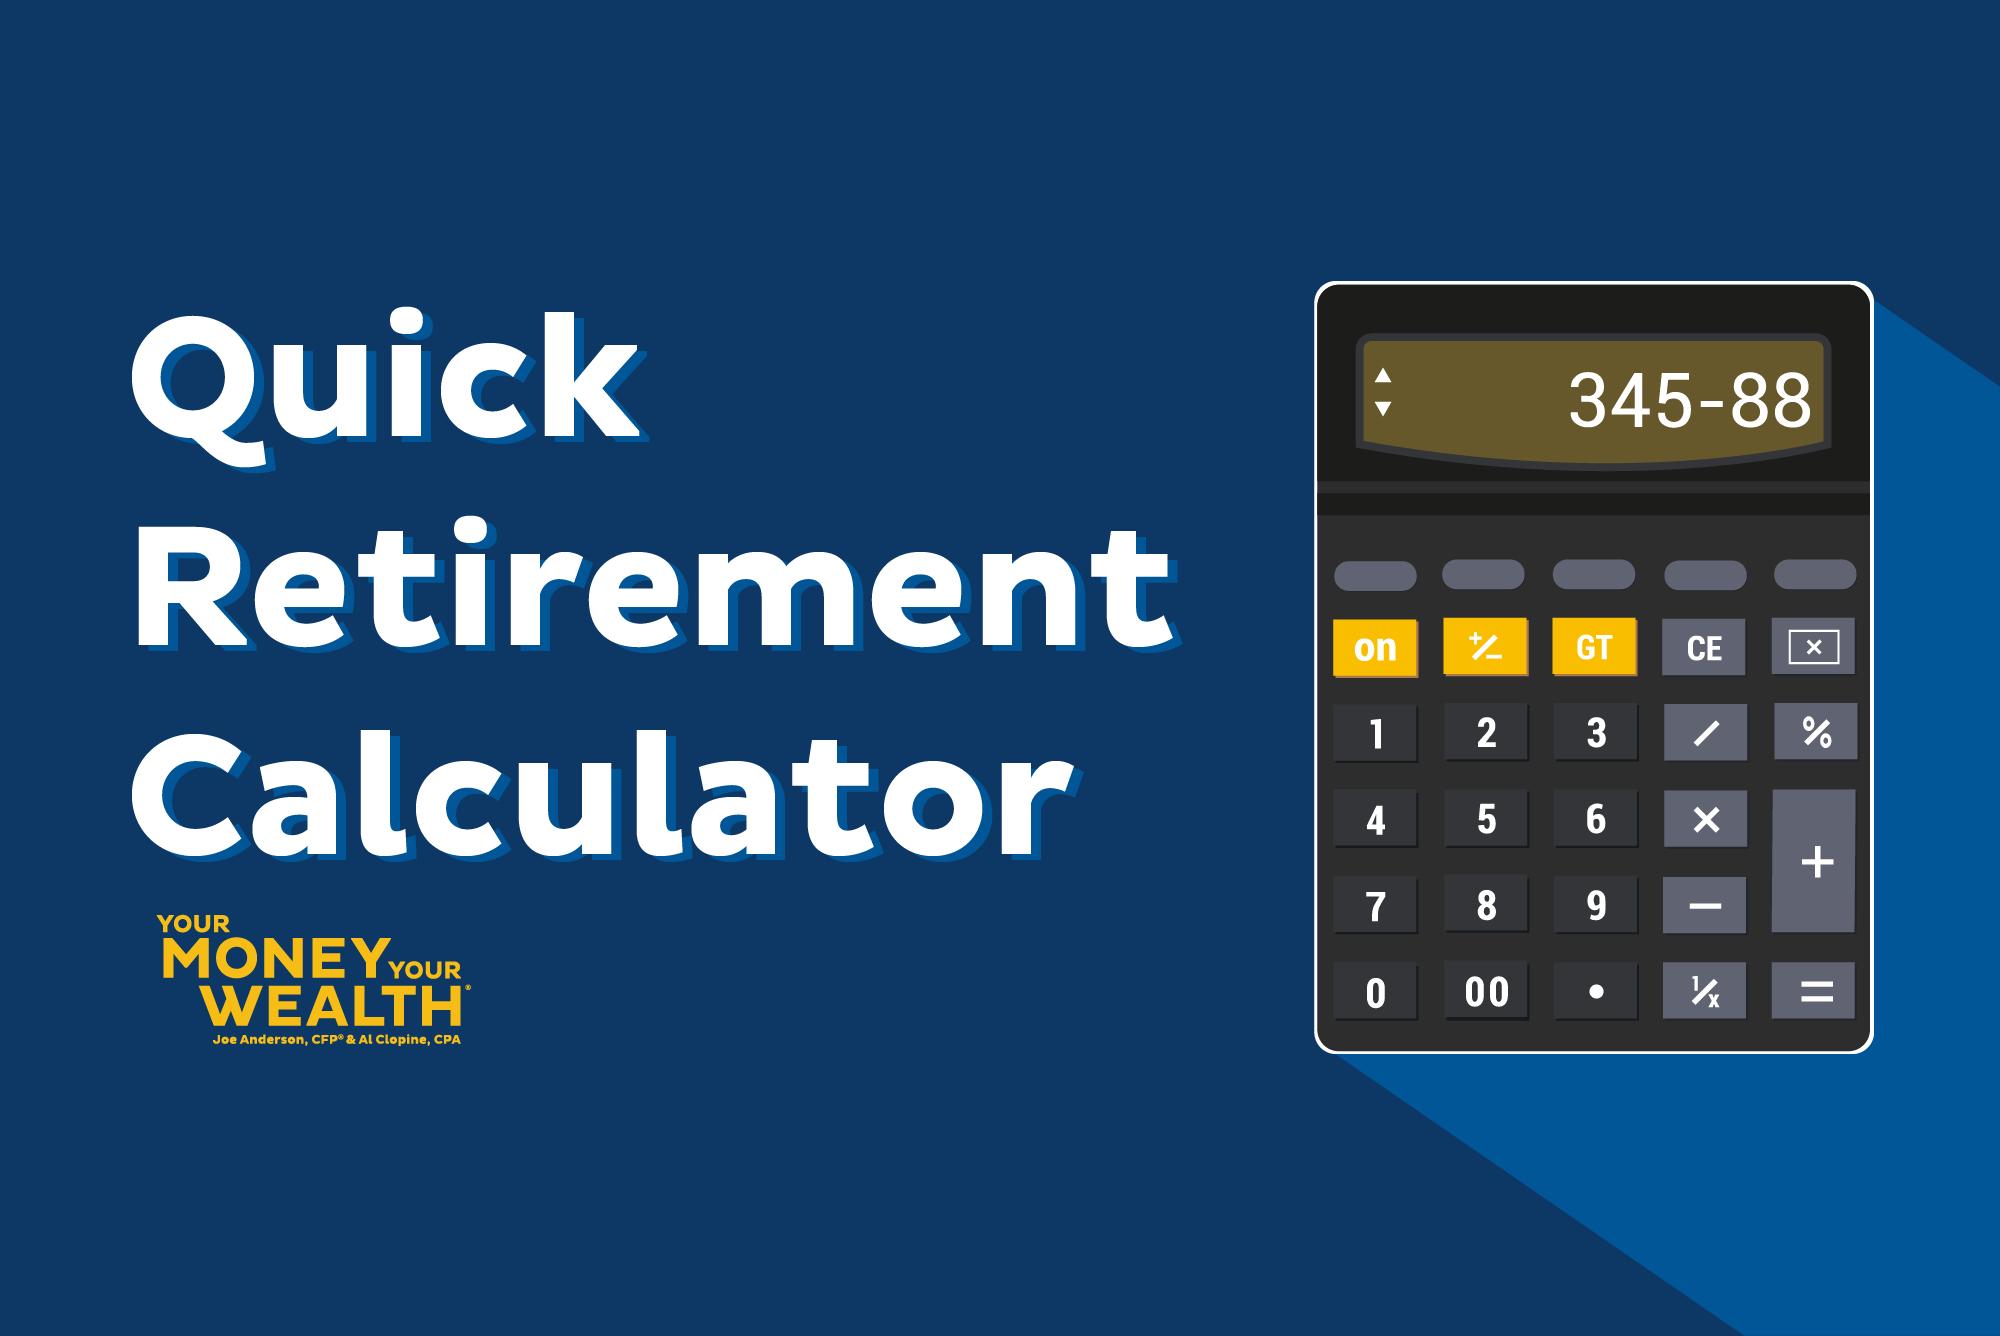 YMYW Quick Retirement Calculator